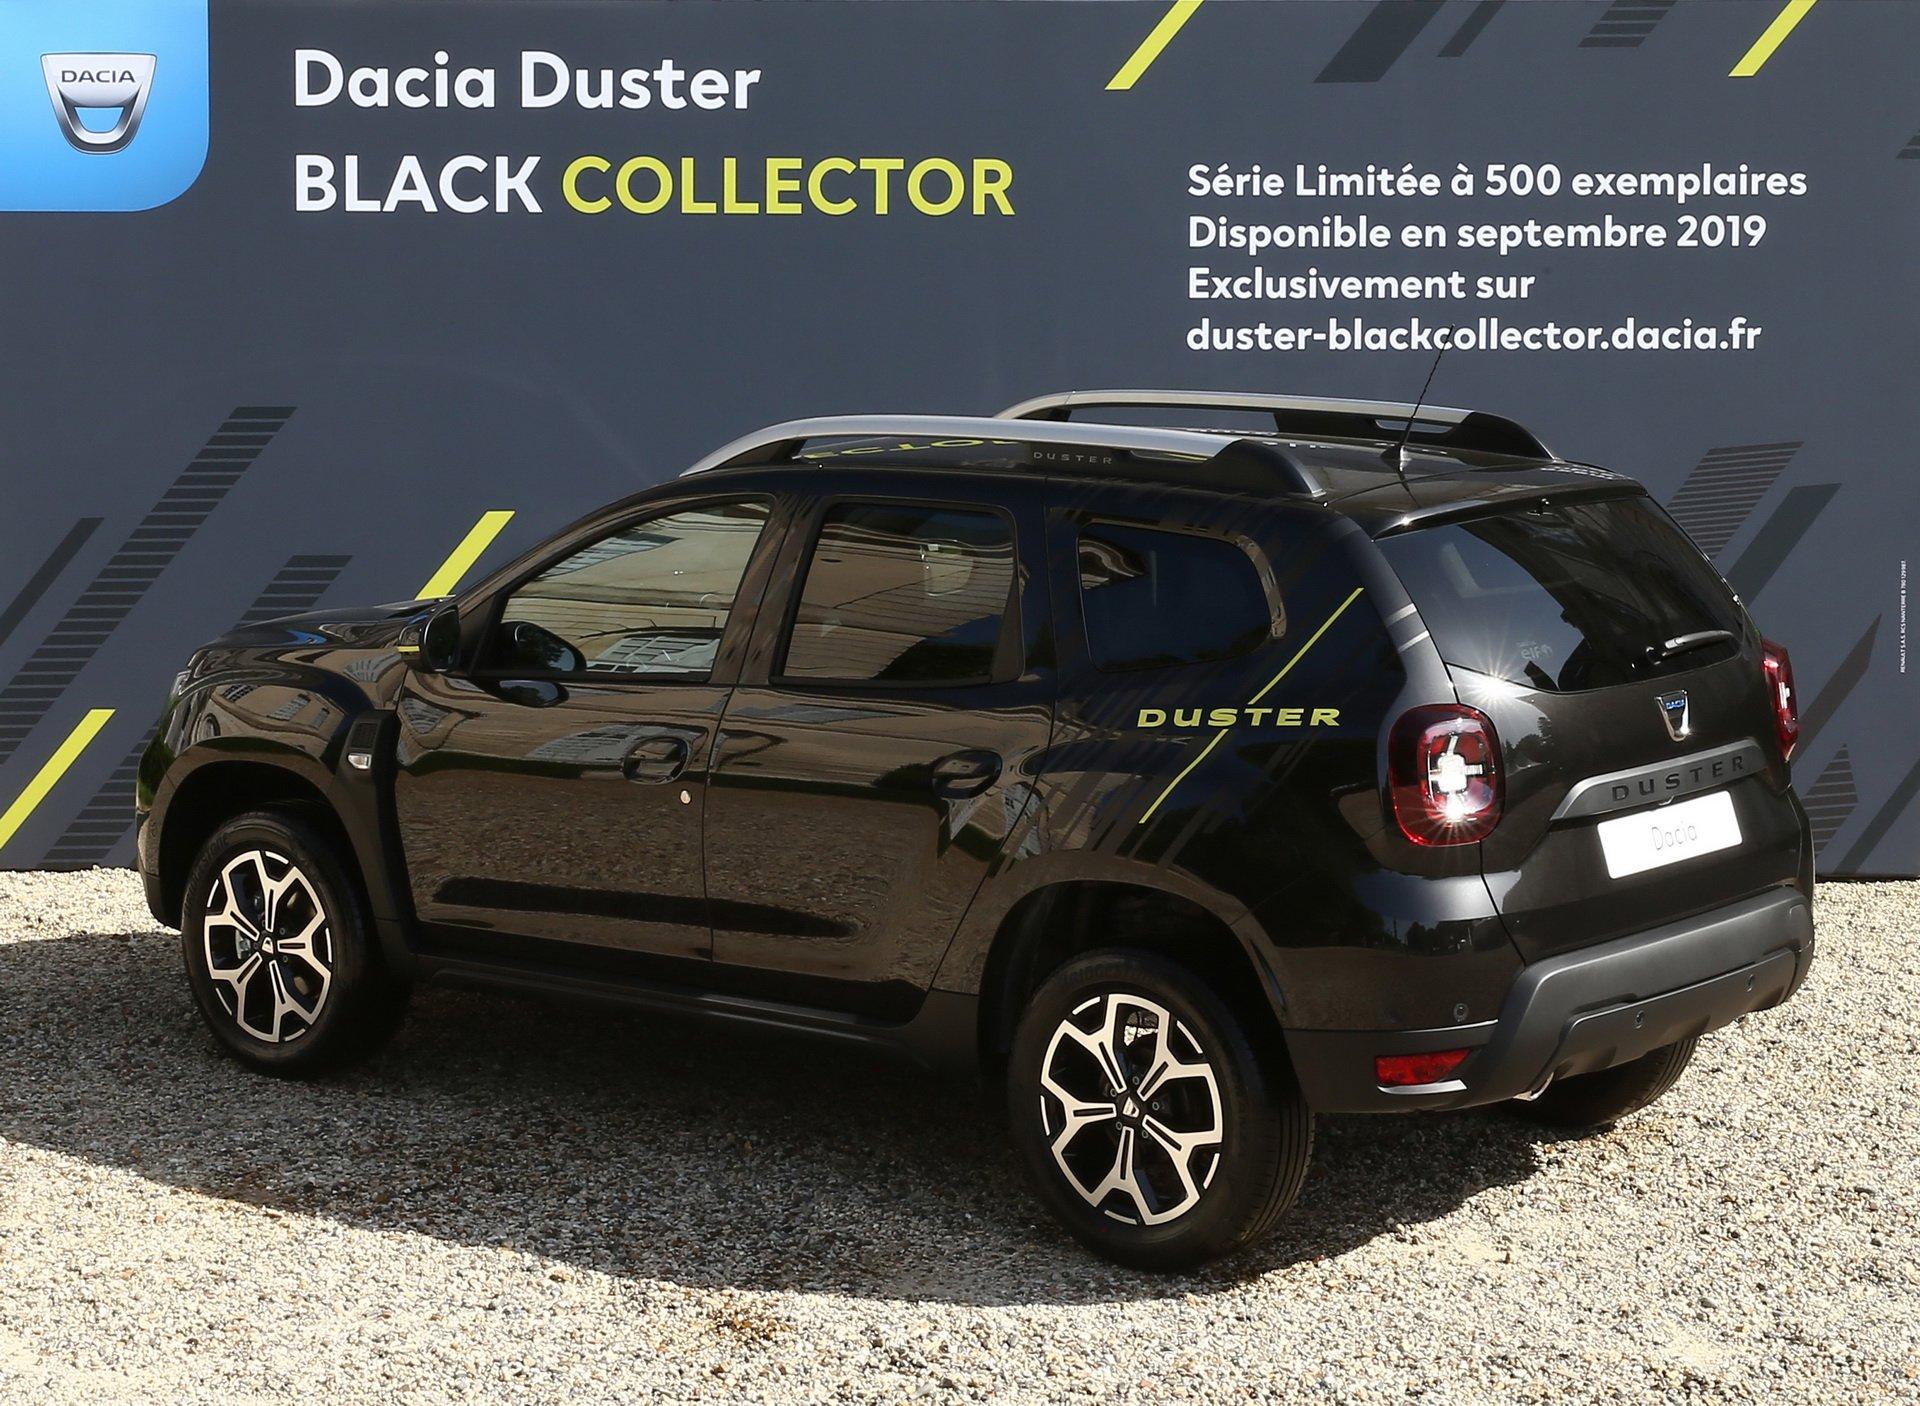 Dacia_Duster_Black_Collector_Edition_0005